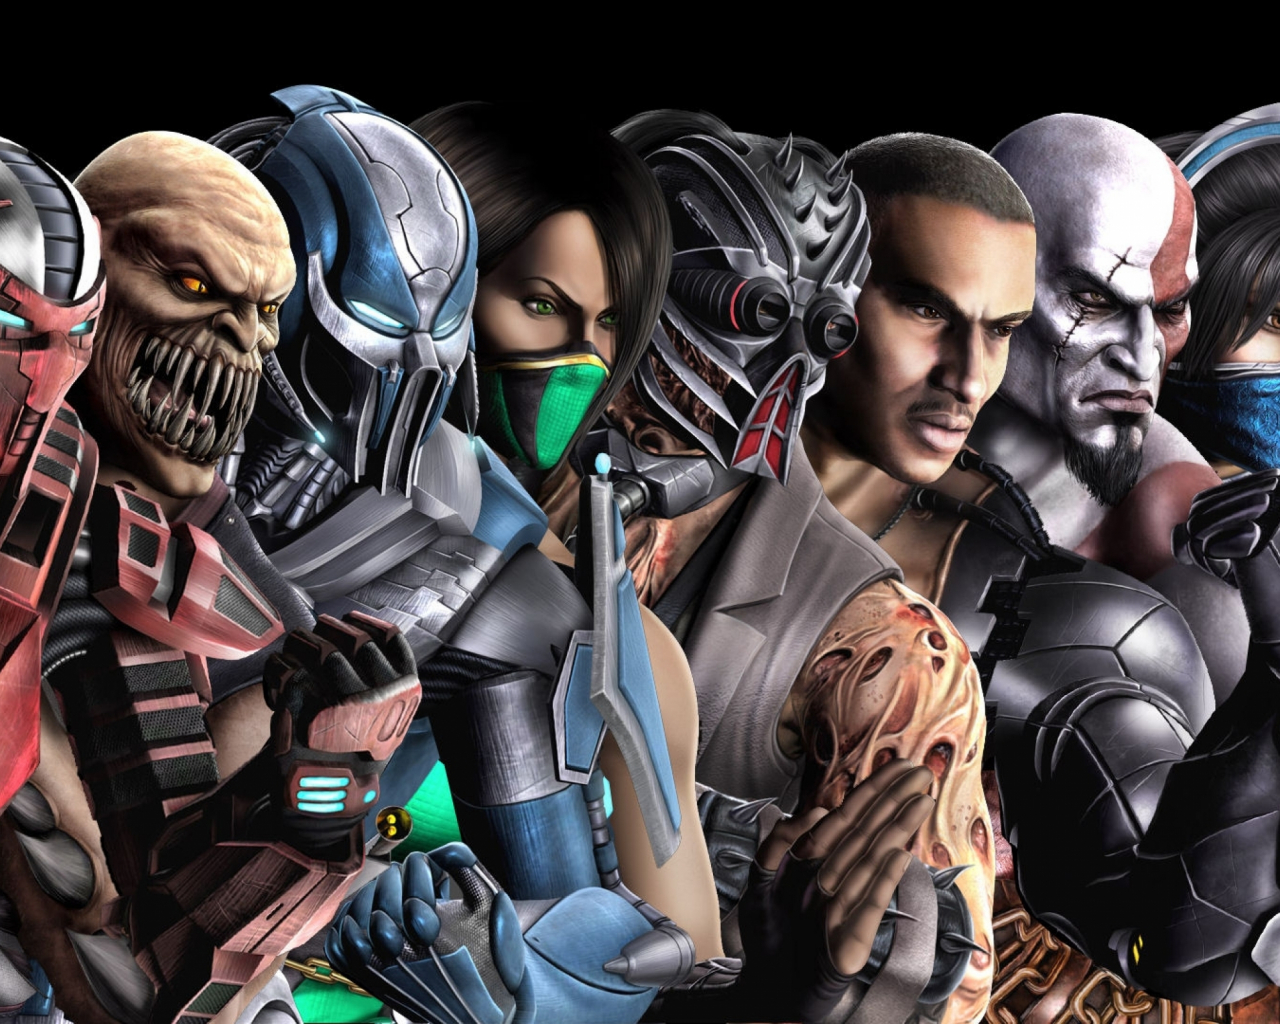 Free Download Mortal Kombat Characters Raiden Multiscreen Conical